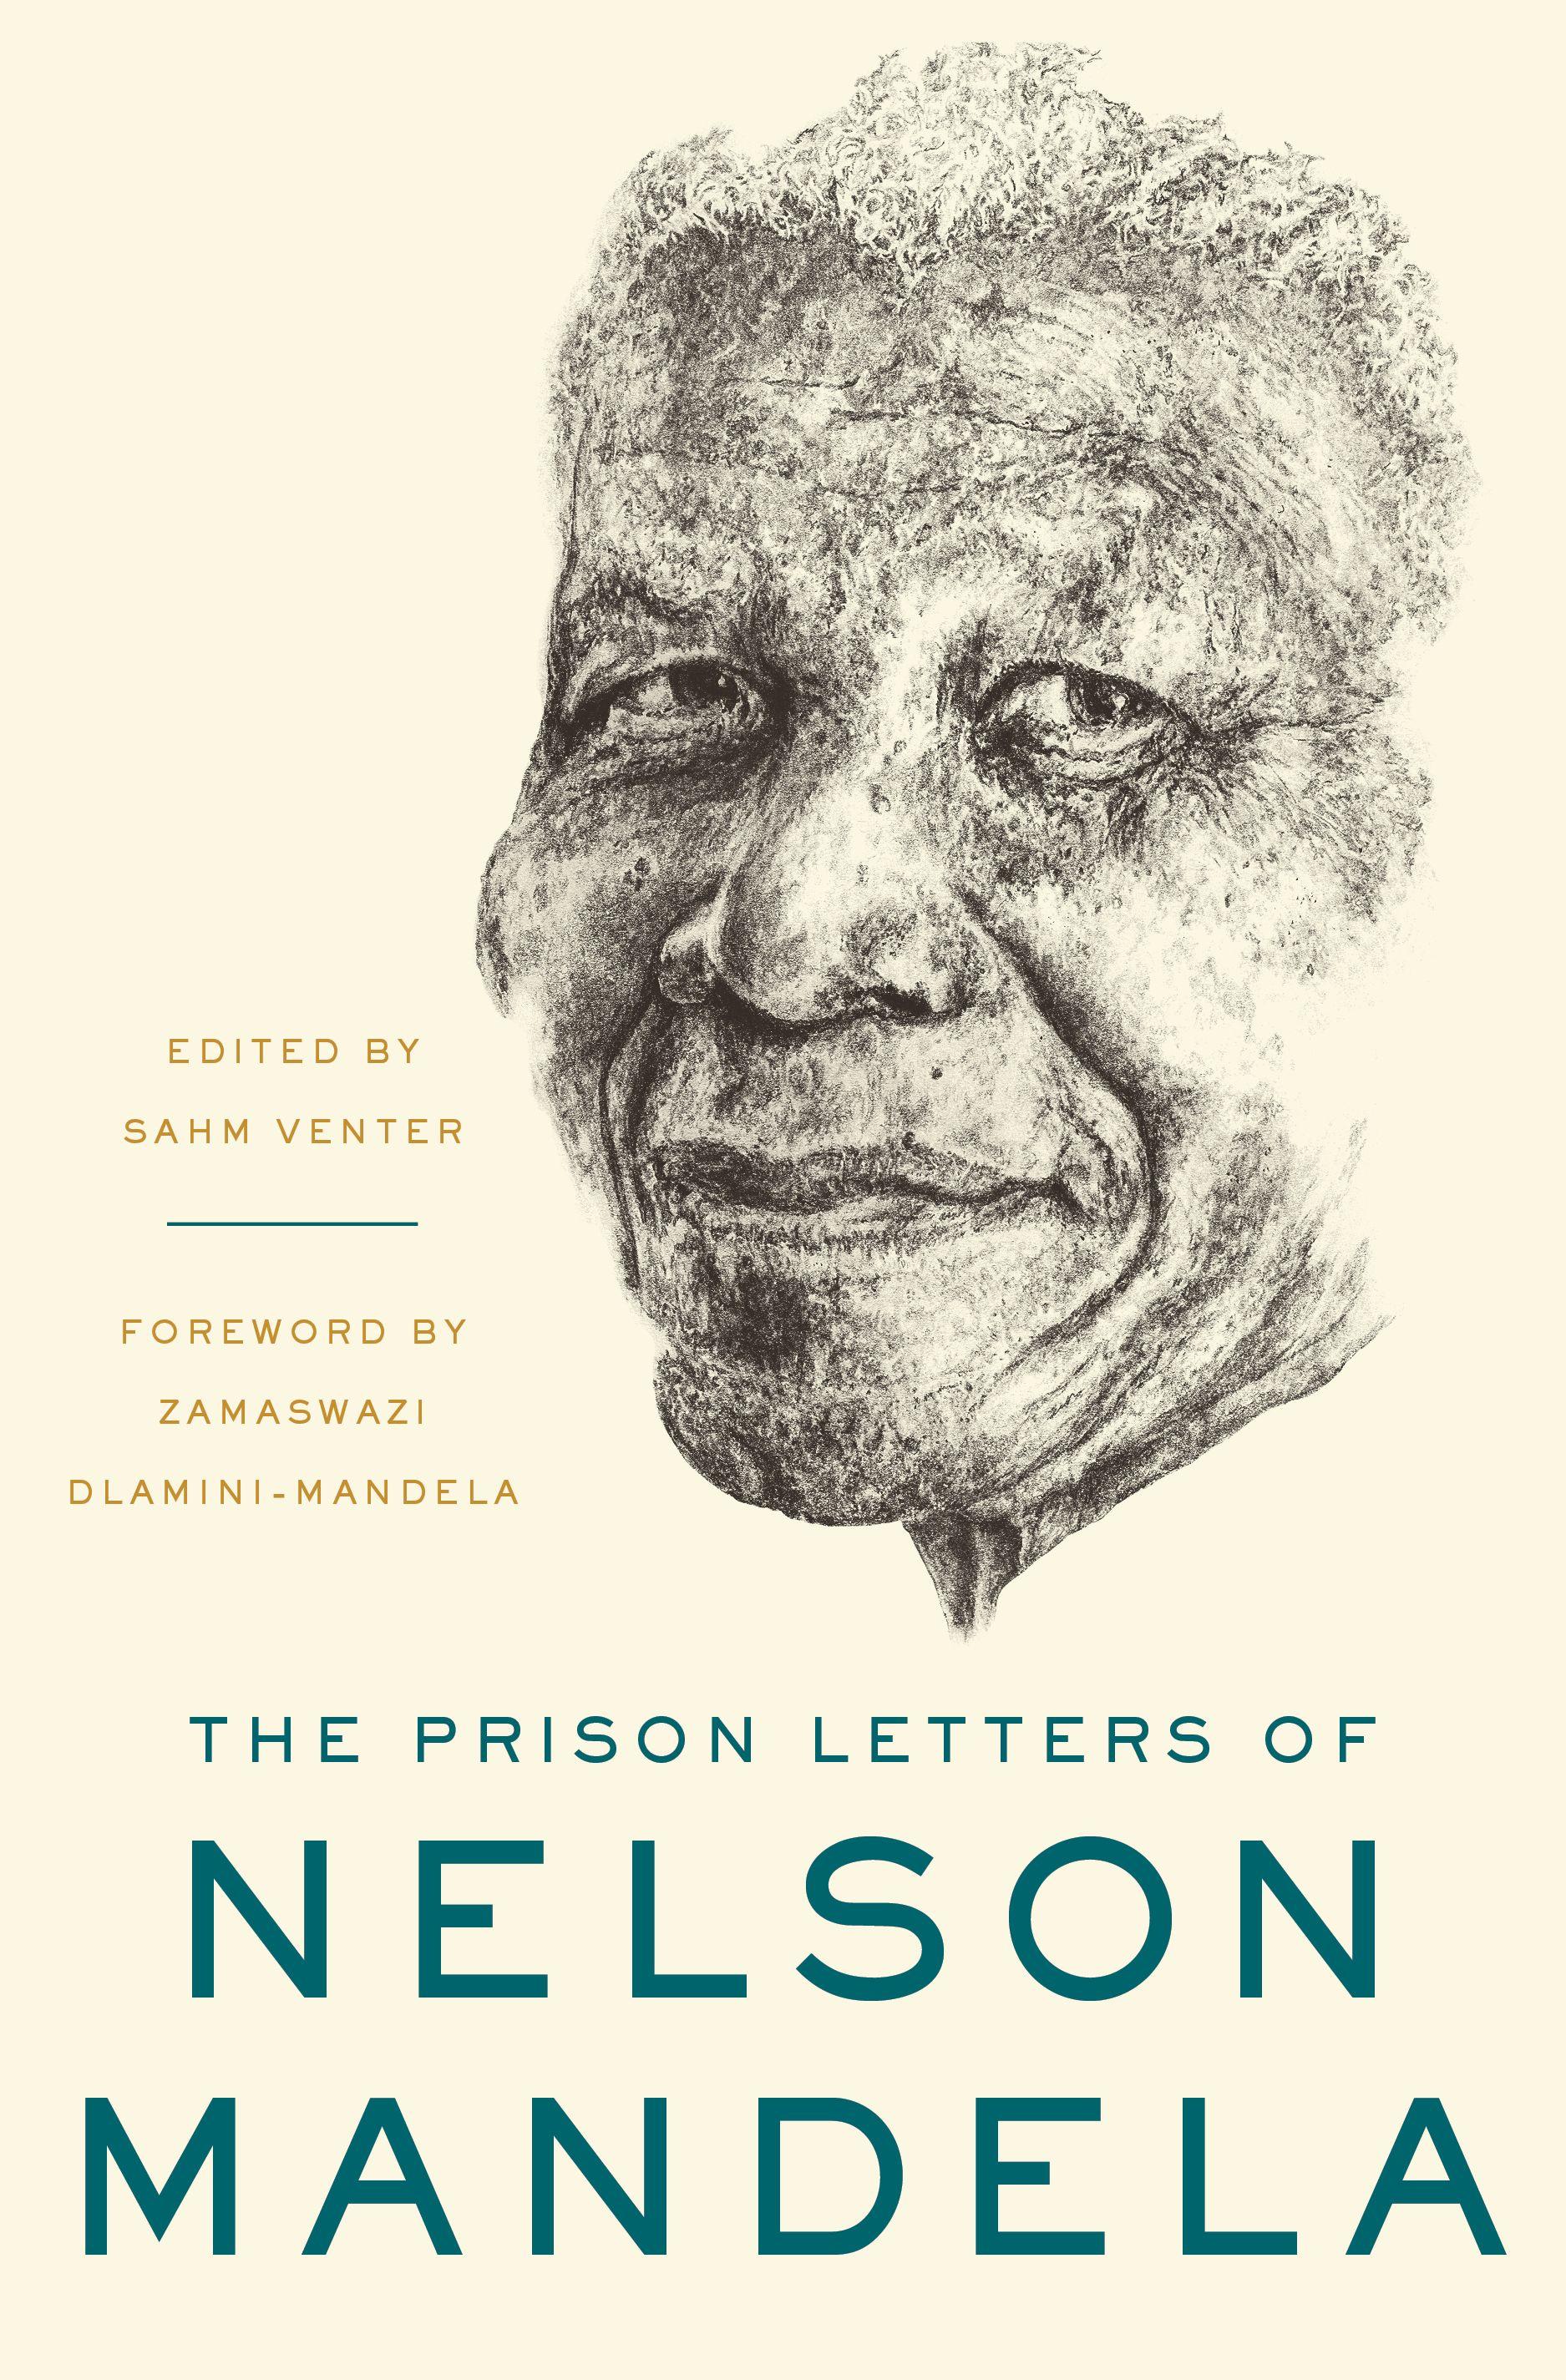 The Prison Letters Of Nelson Mandela Edited By Sahm Venter Spring